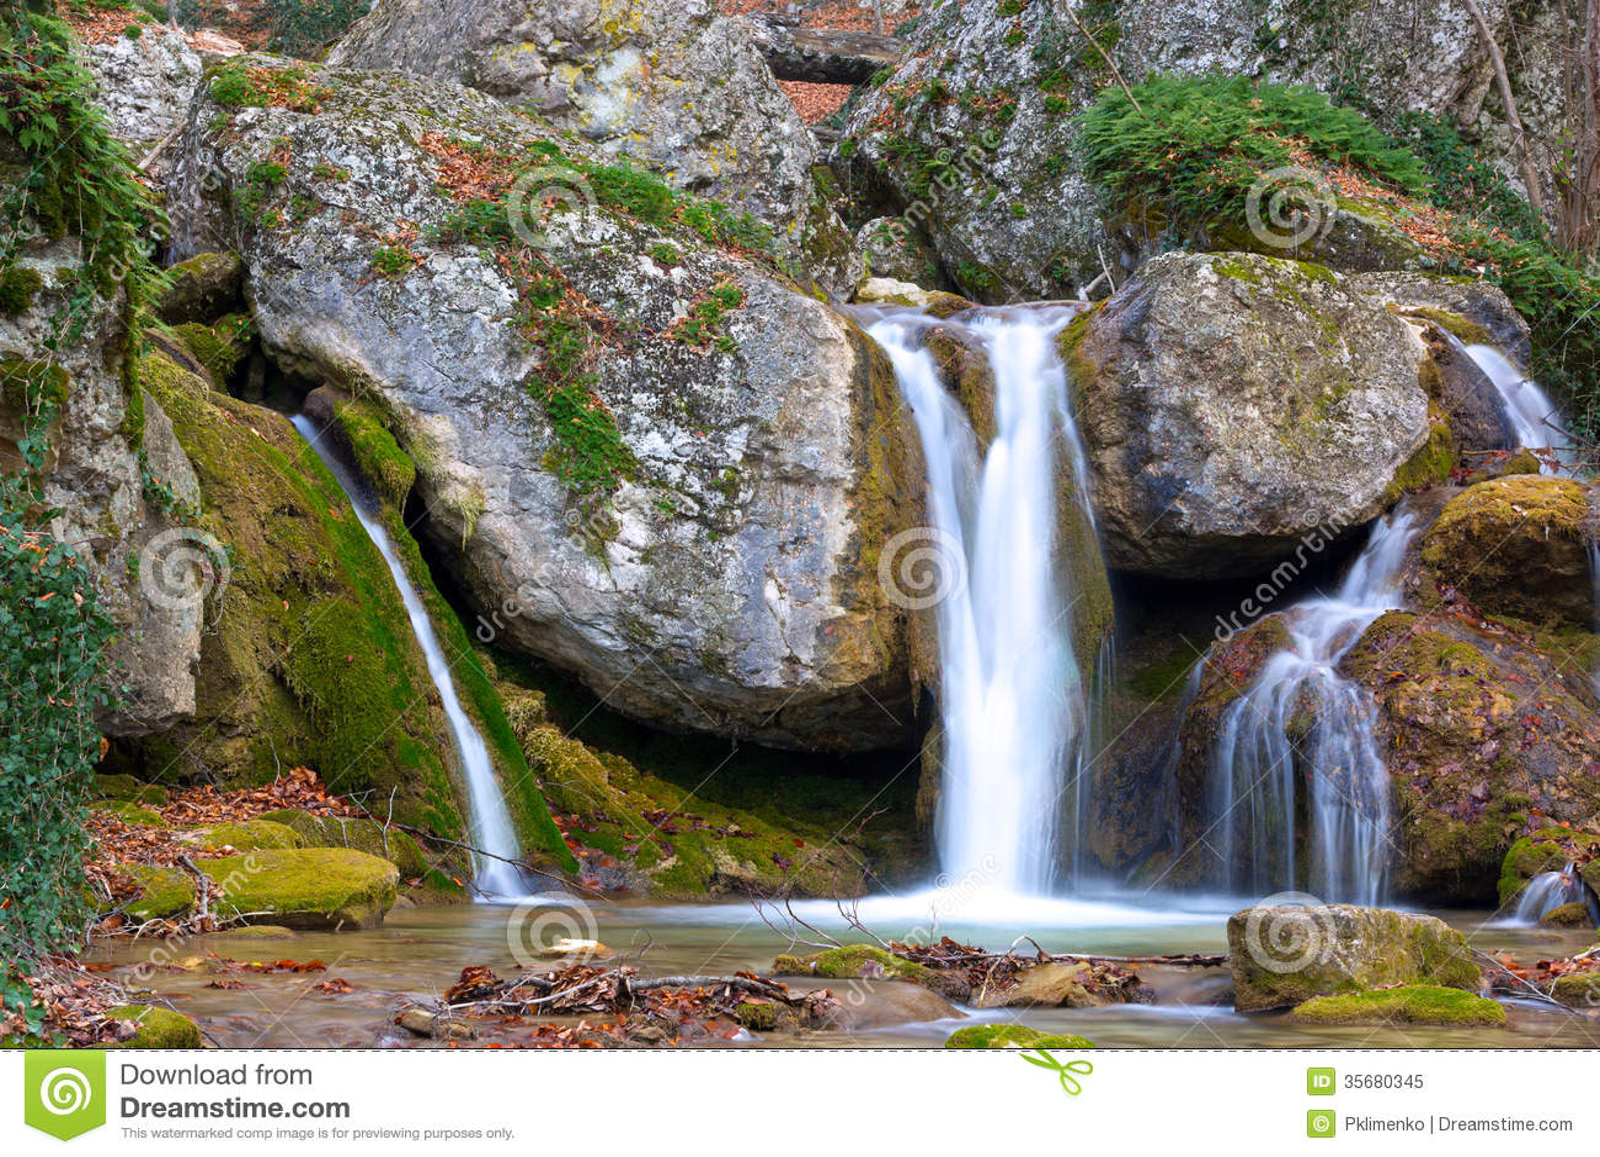 Nice Waterfall Stock Image. Image Of Rock, Splash, Park